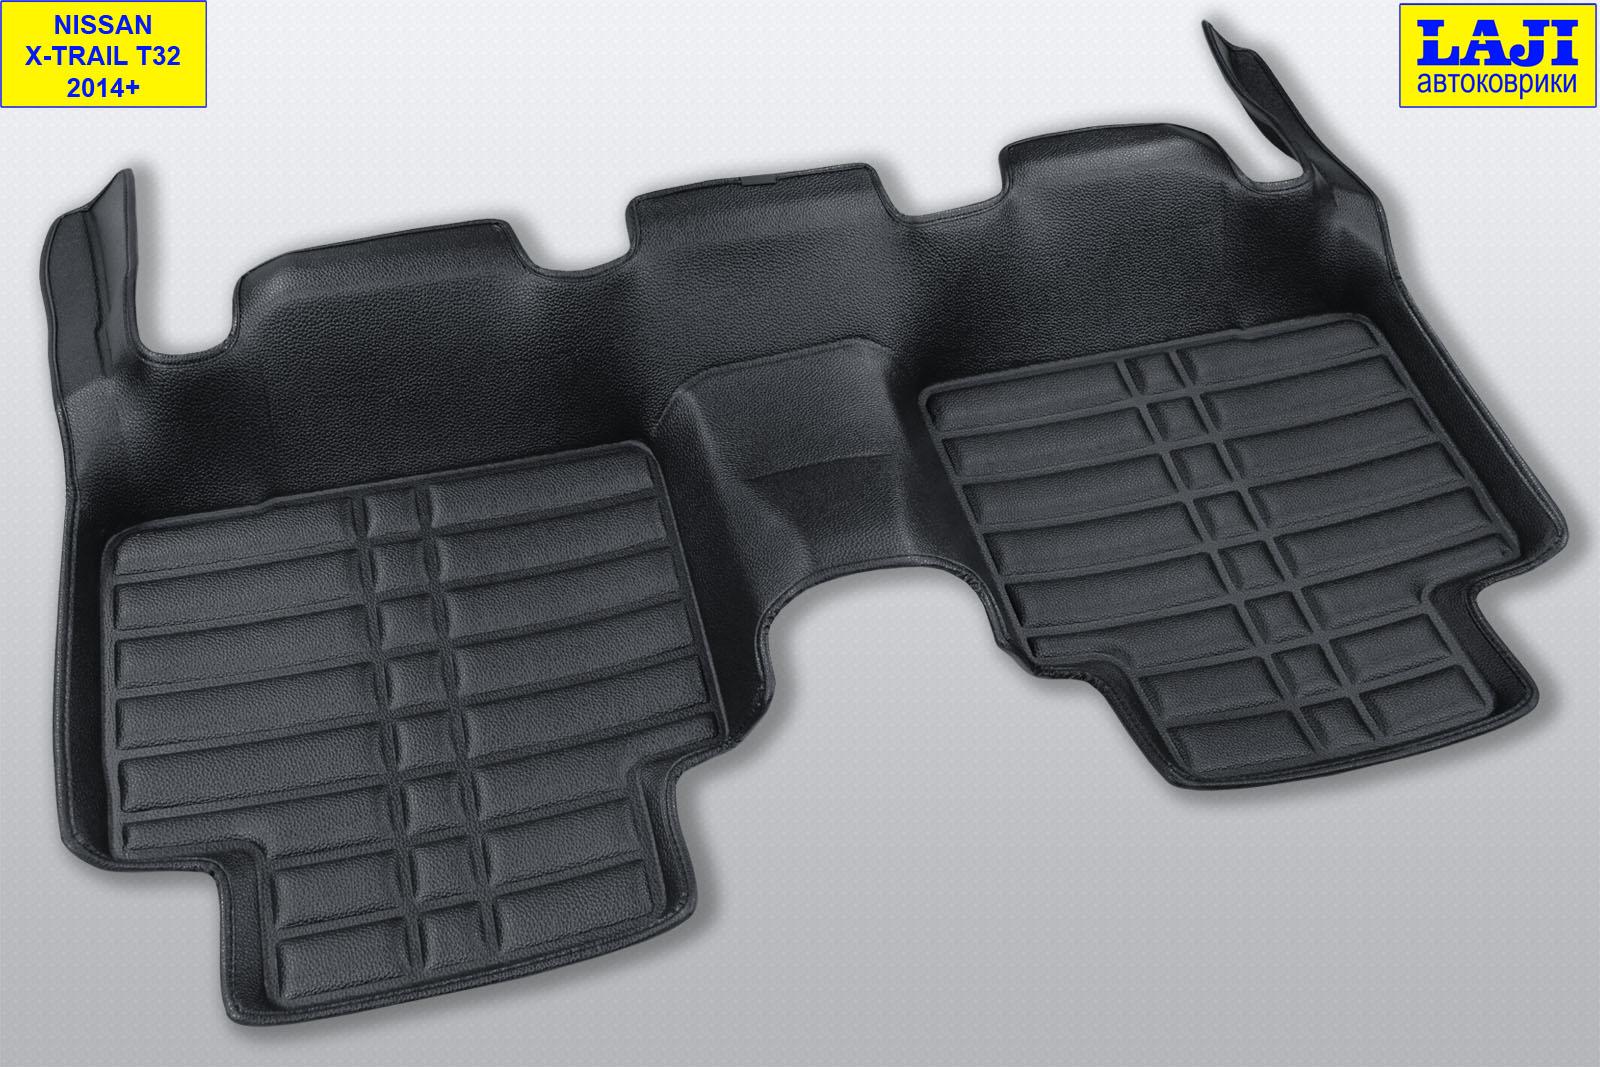 5D коврики в салон Nissan X-Trail 3 T32 2014-н.в. 10